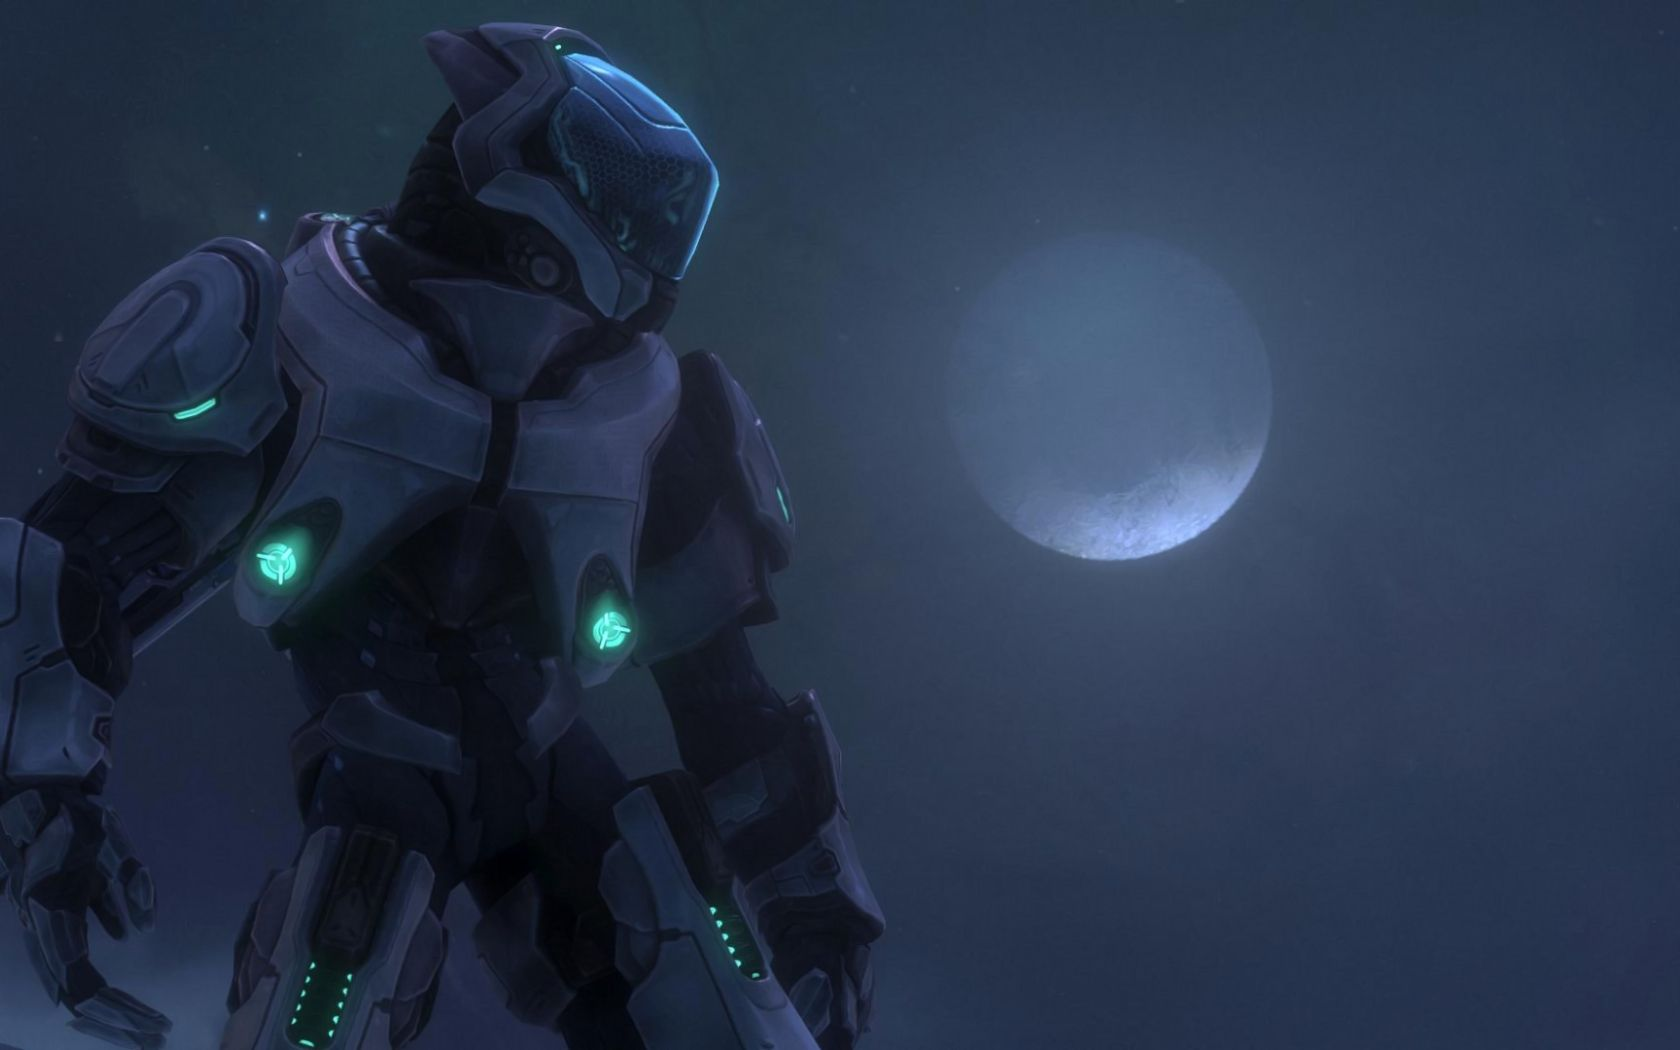 Halo Nightfall Wallpapers Top Free Halo Nightfall Backgrounds Wallpaperaccess